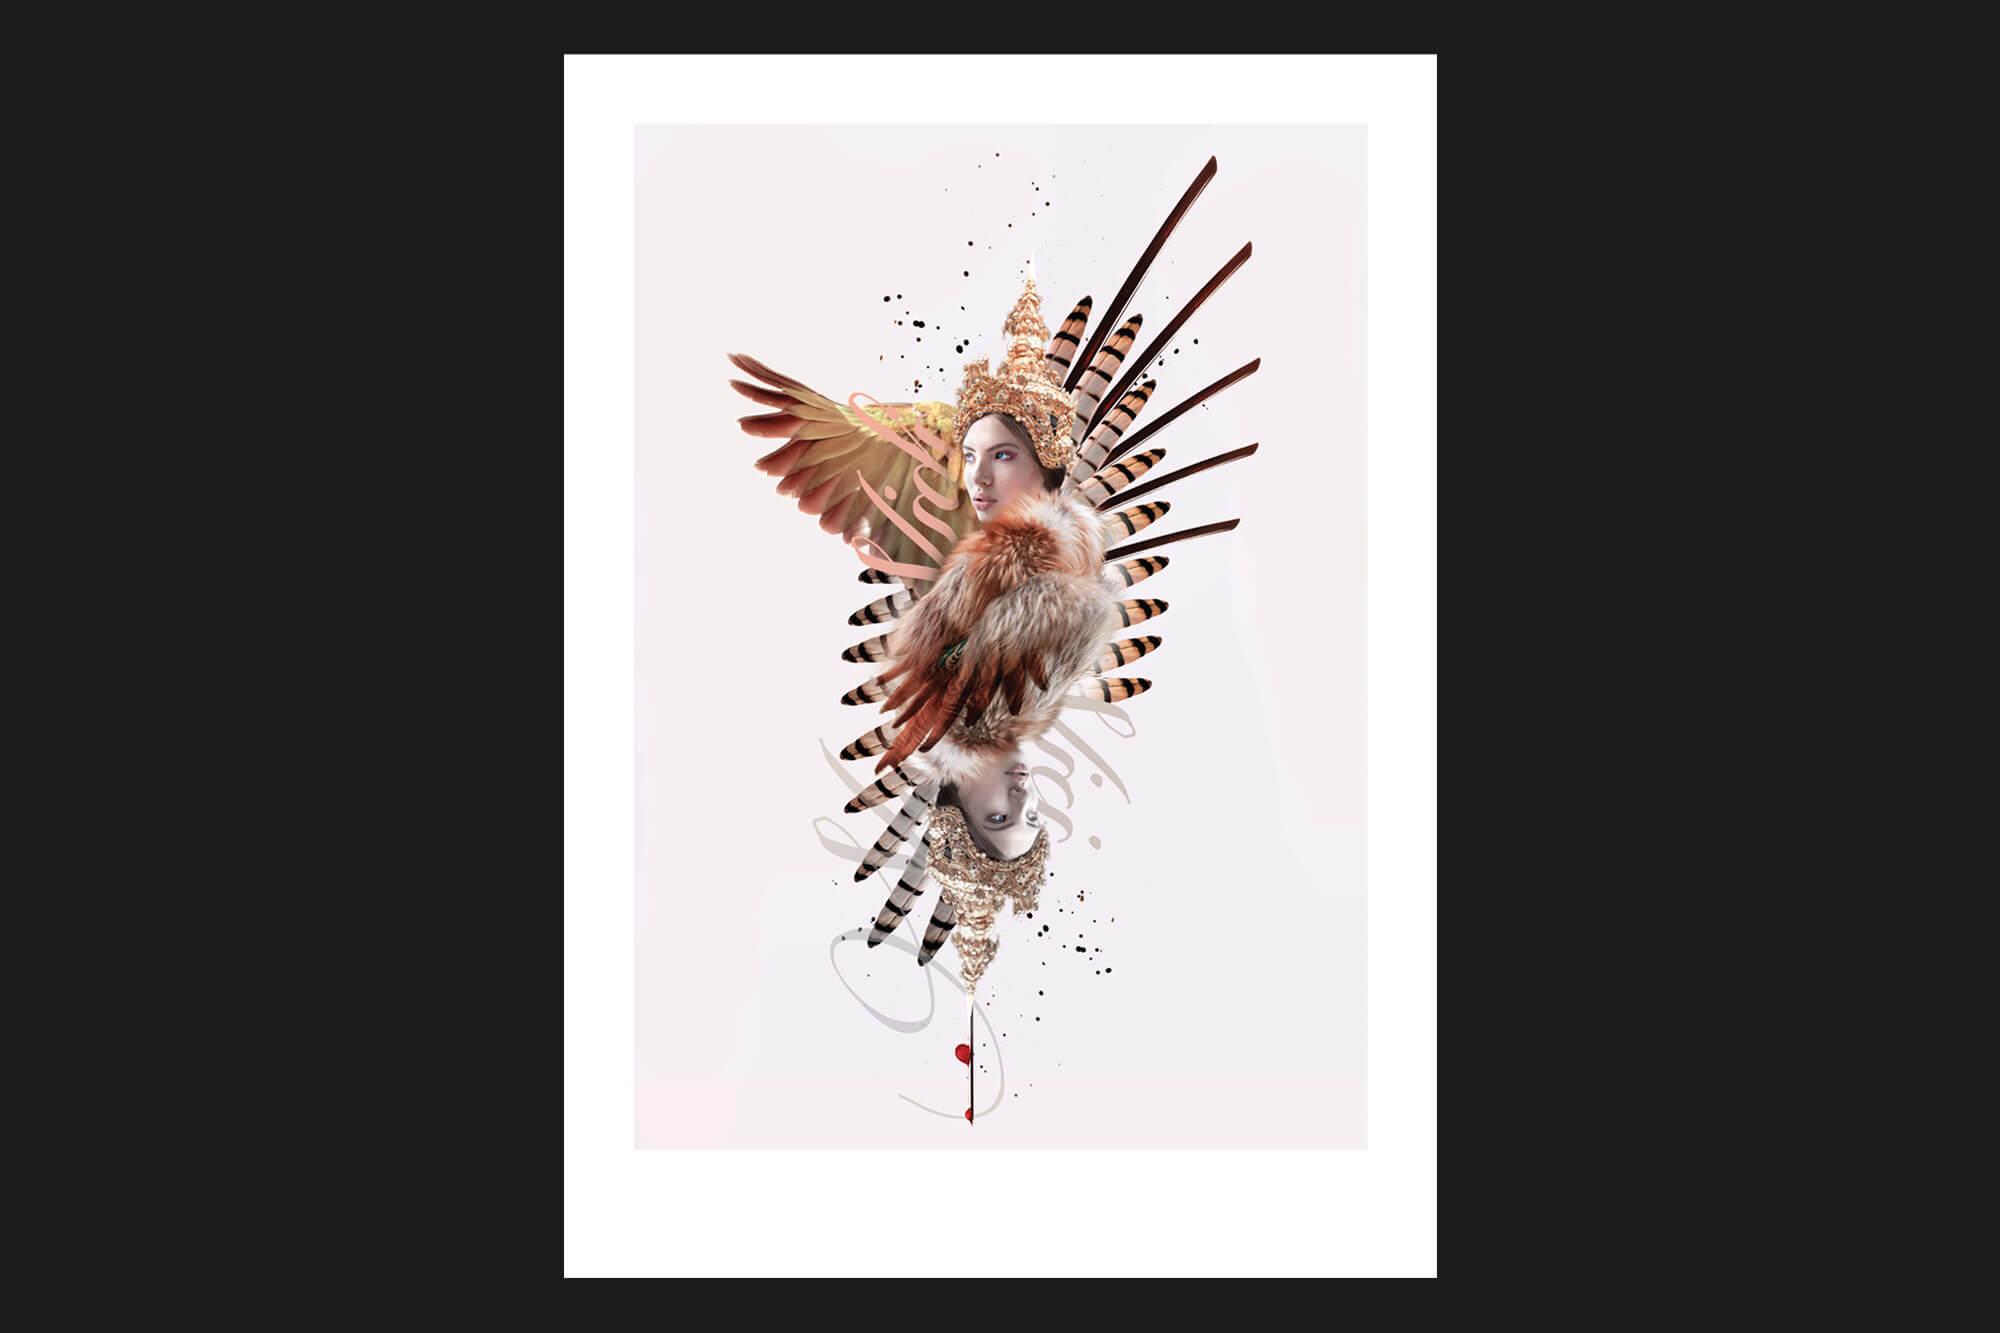 gareth-paul-jones-studio-design-neringa-rekasiute-photography-7788-art-identity-series-cs-03